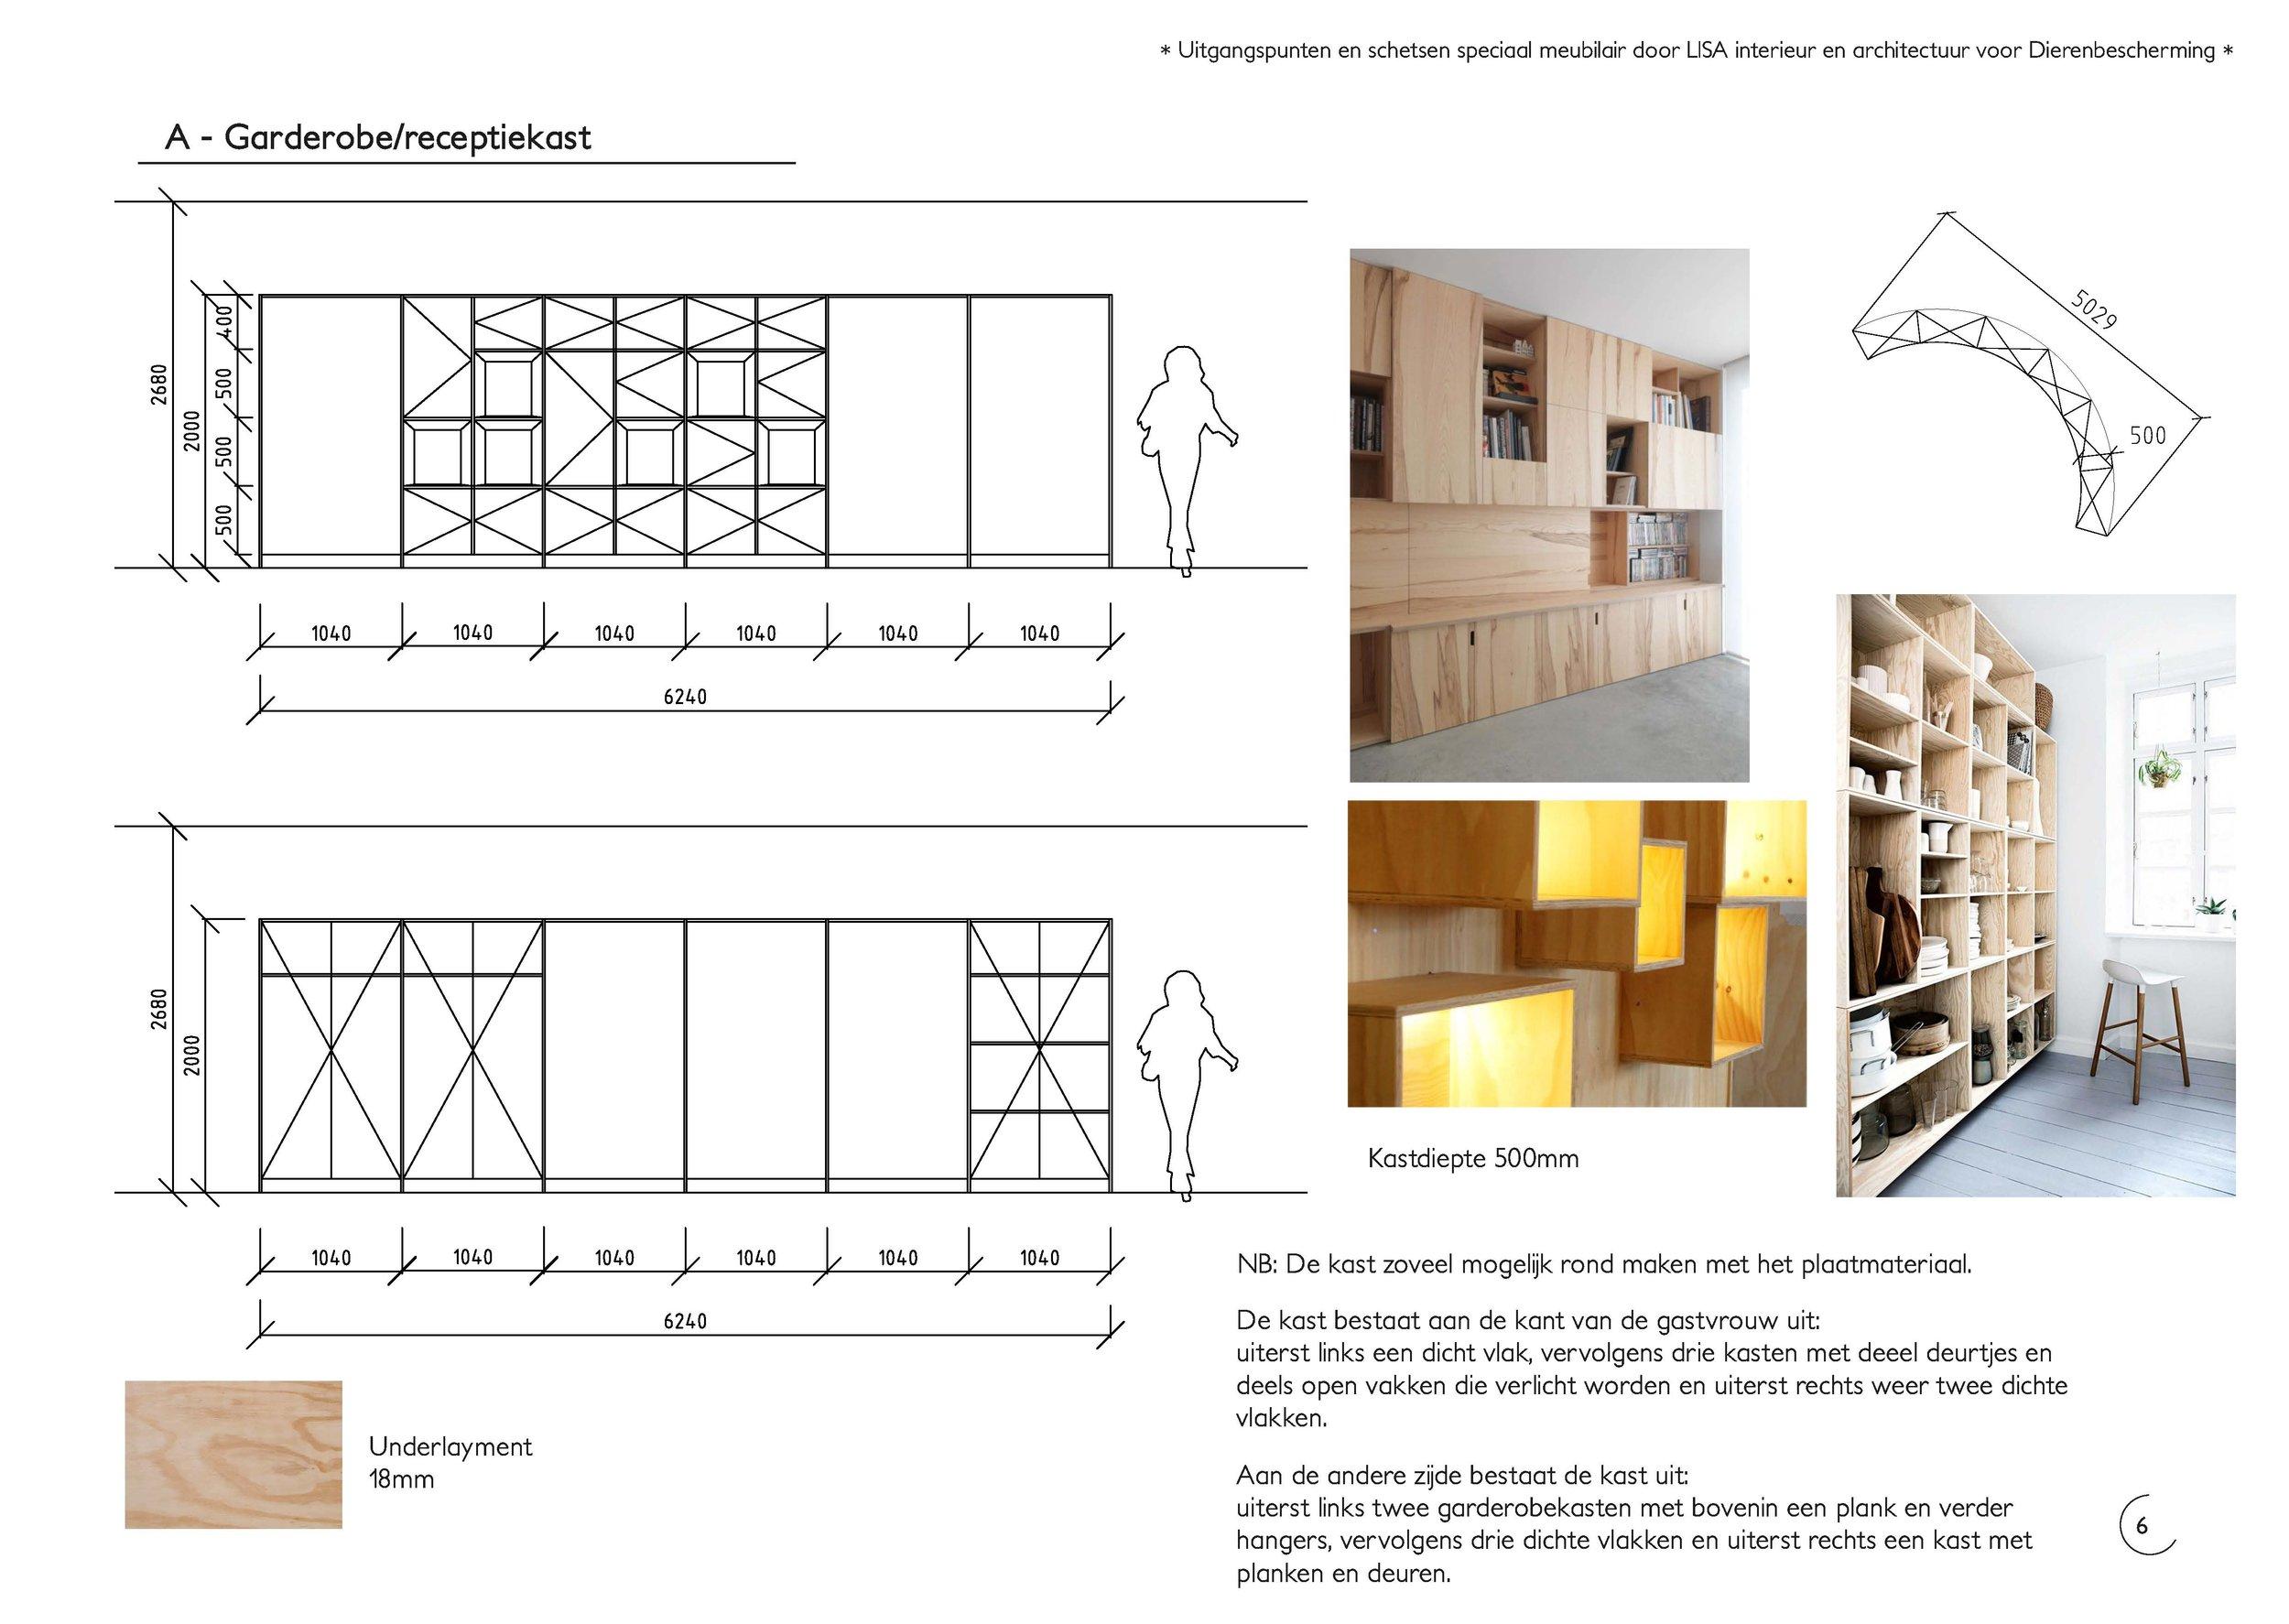 04 Dierenbescherming Uitgangspunten en Schetsen Speciaal meubilair - 14.03.2016.jpg